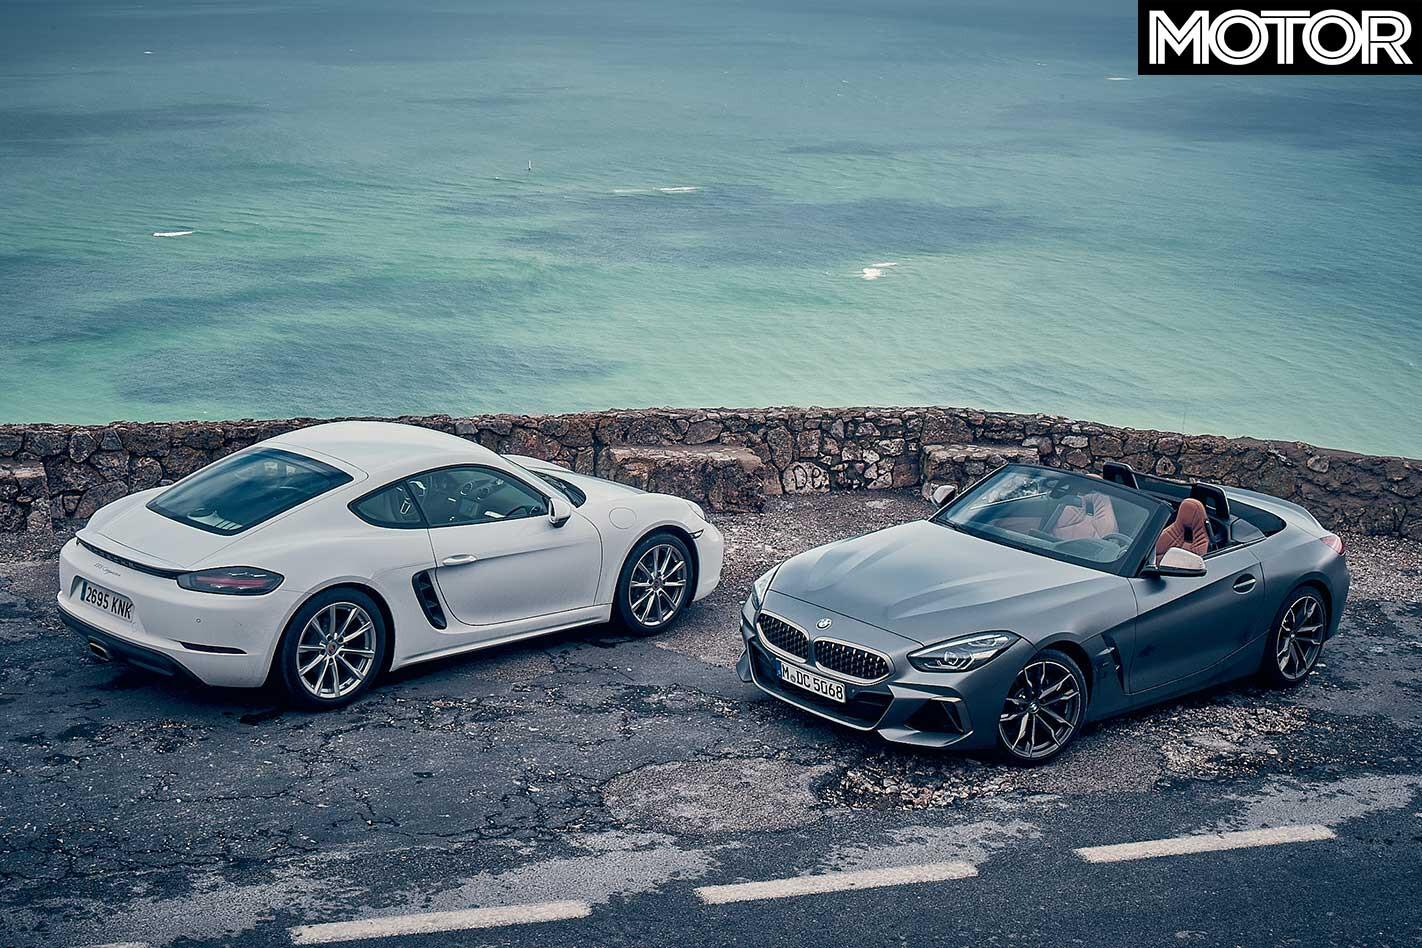 2018 BMW Z 4 M 40 I Vs Porsche 718 Cayman Top Design Comparison Jpg